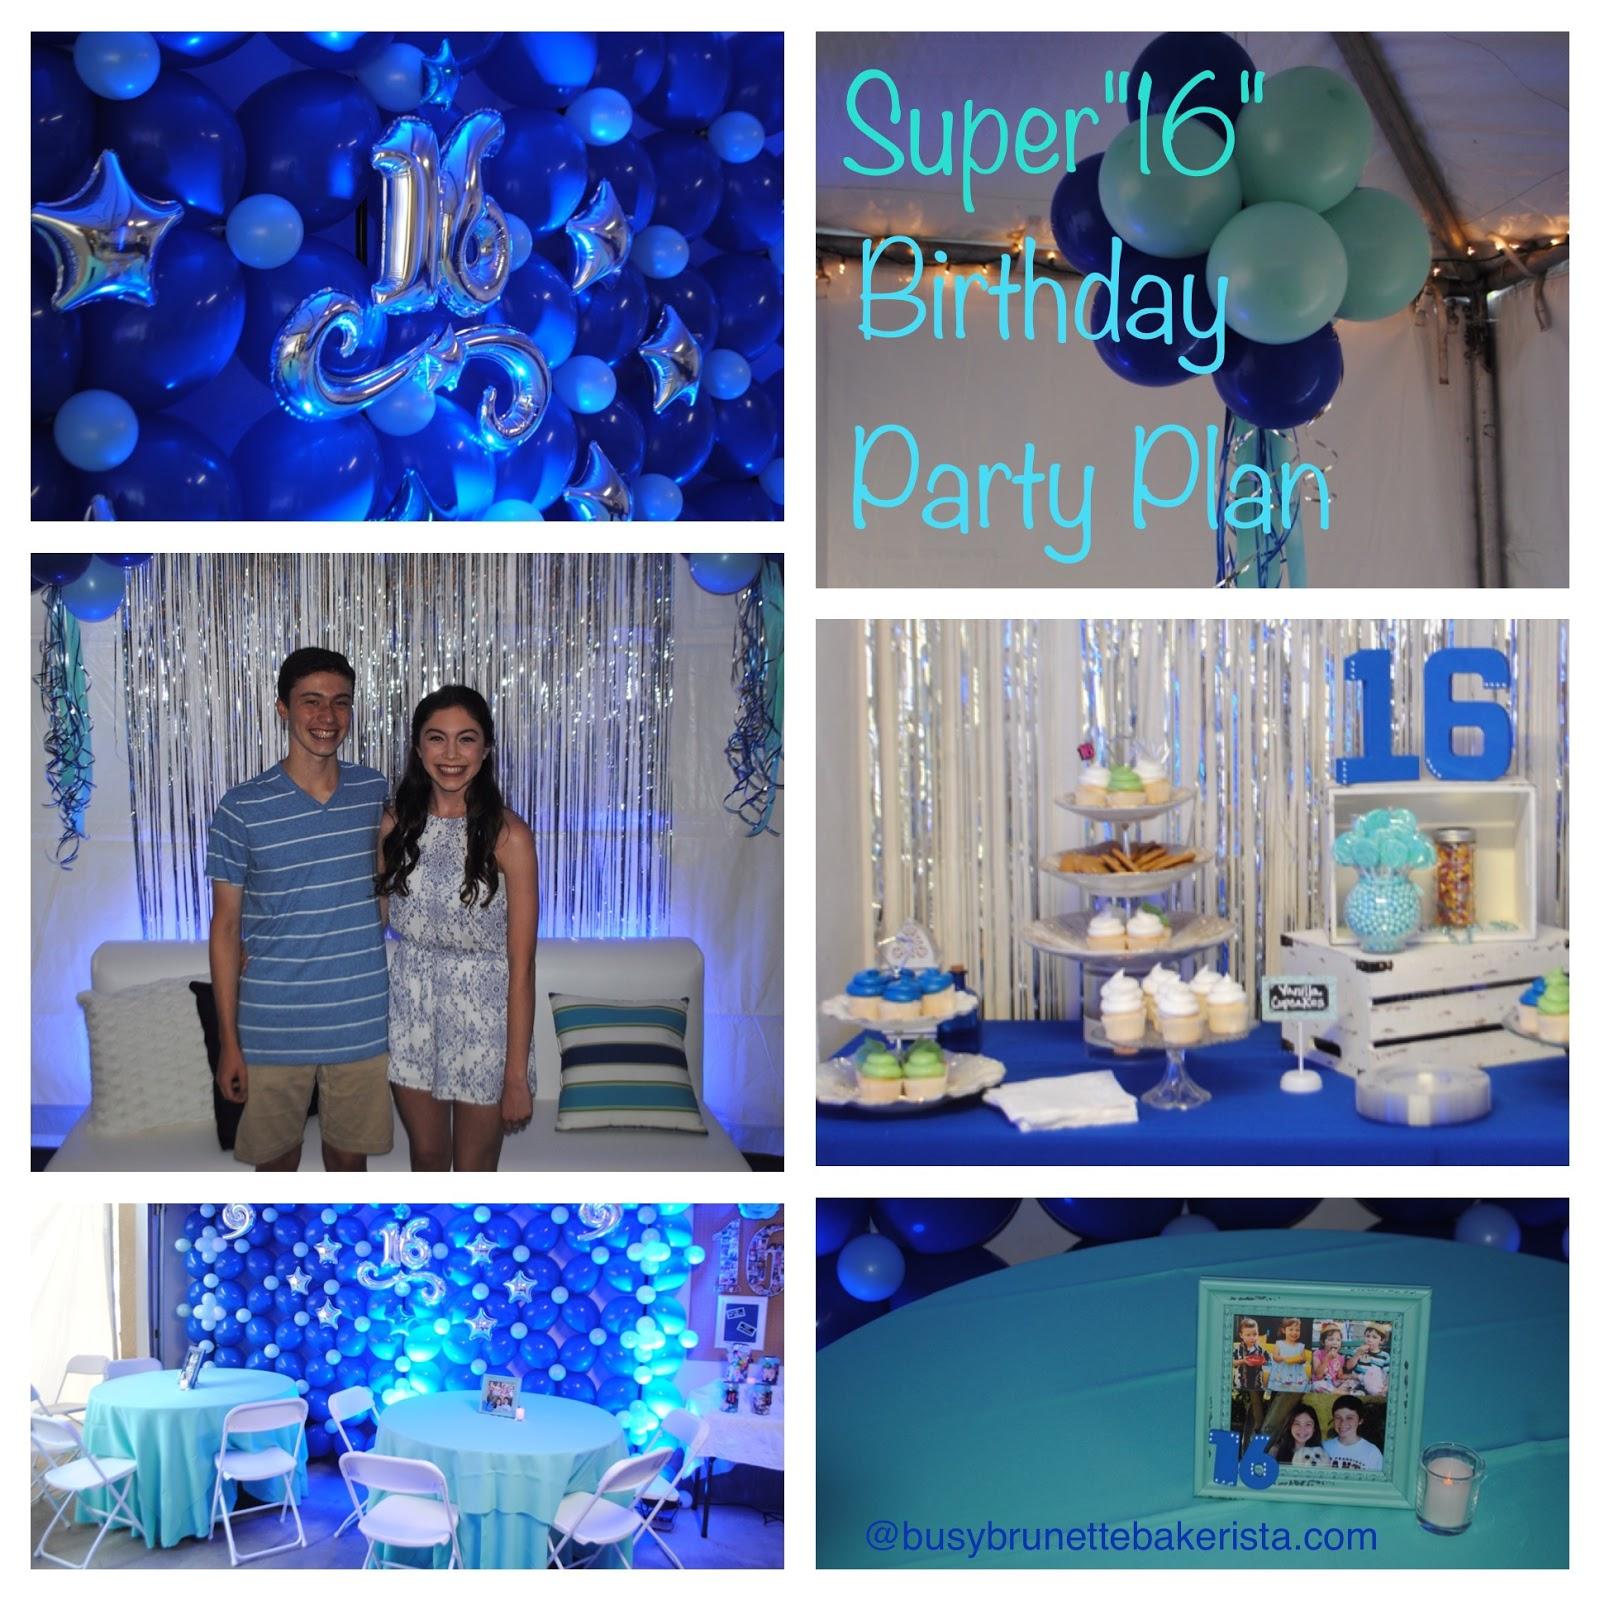 Super Sixteenth Birthday Party